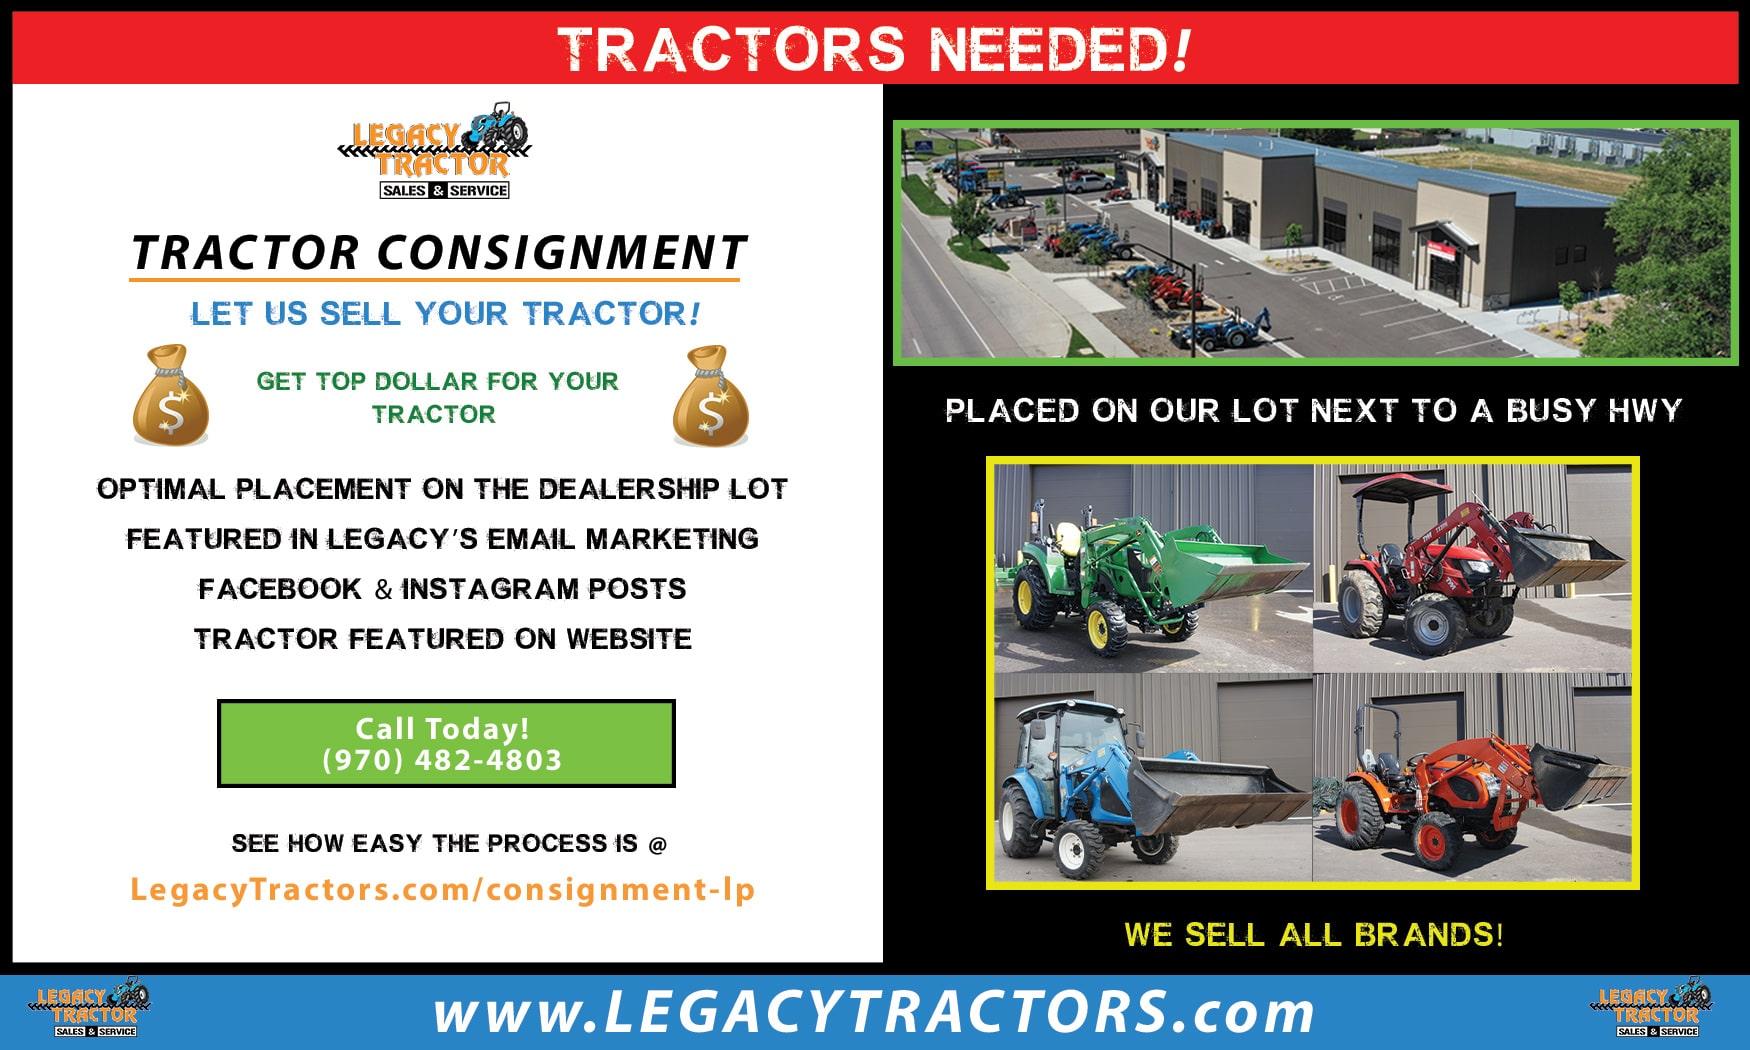 Legacy-Tractors---2021-Tractors-Needed-(Consignment)-4